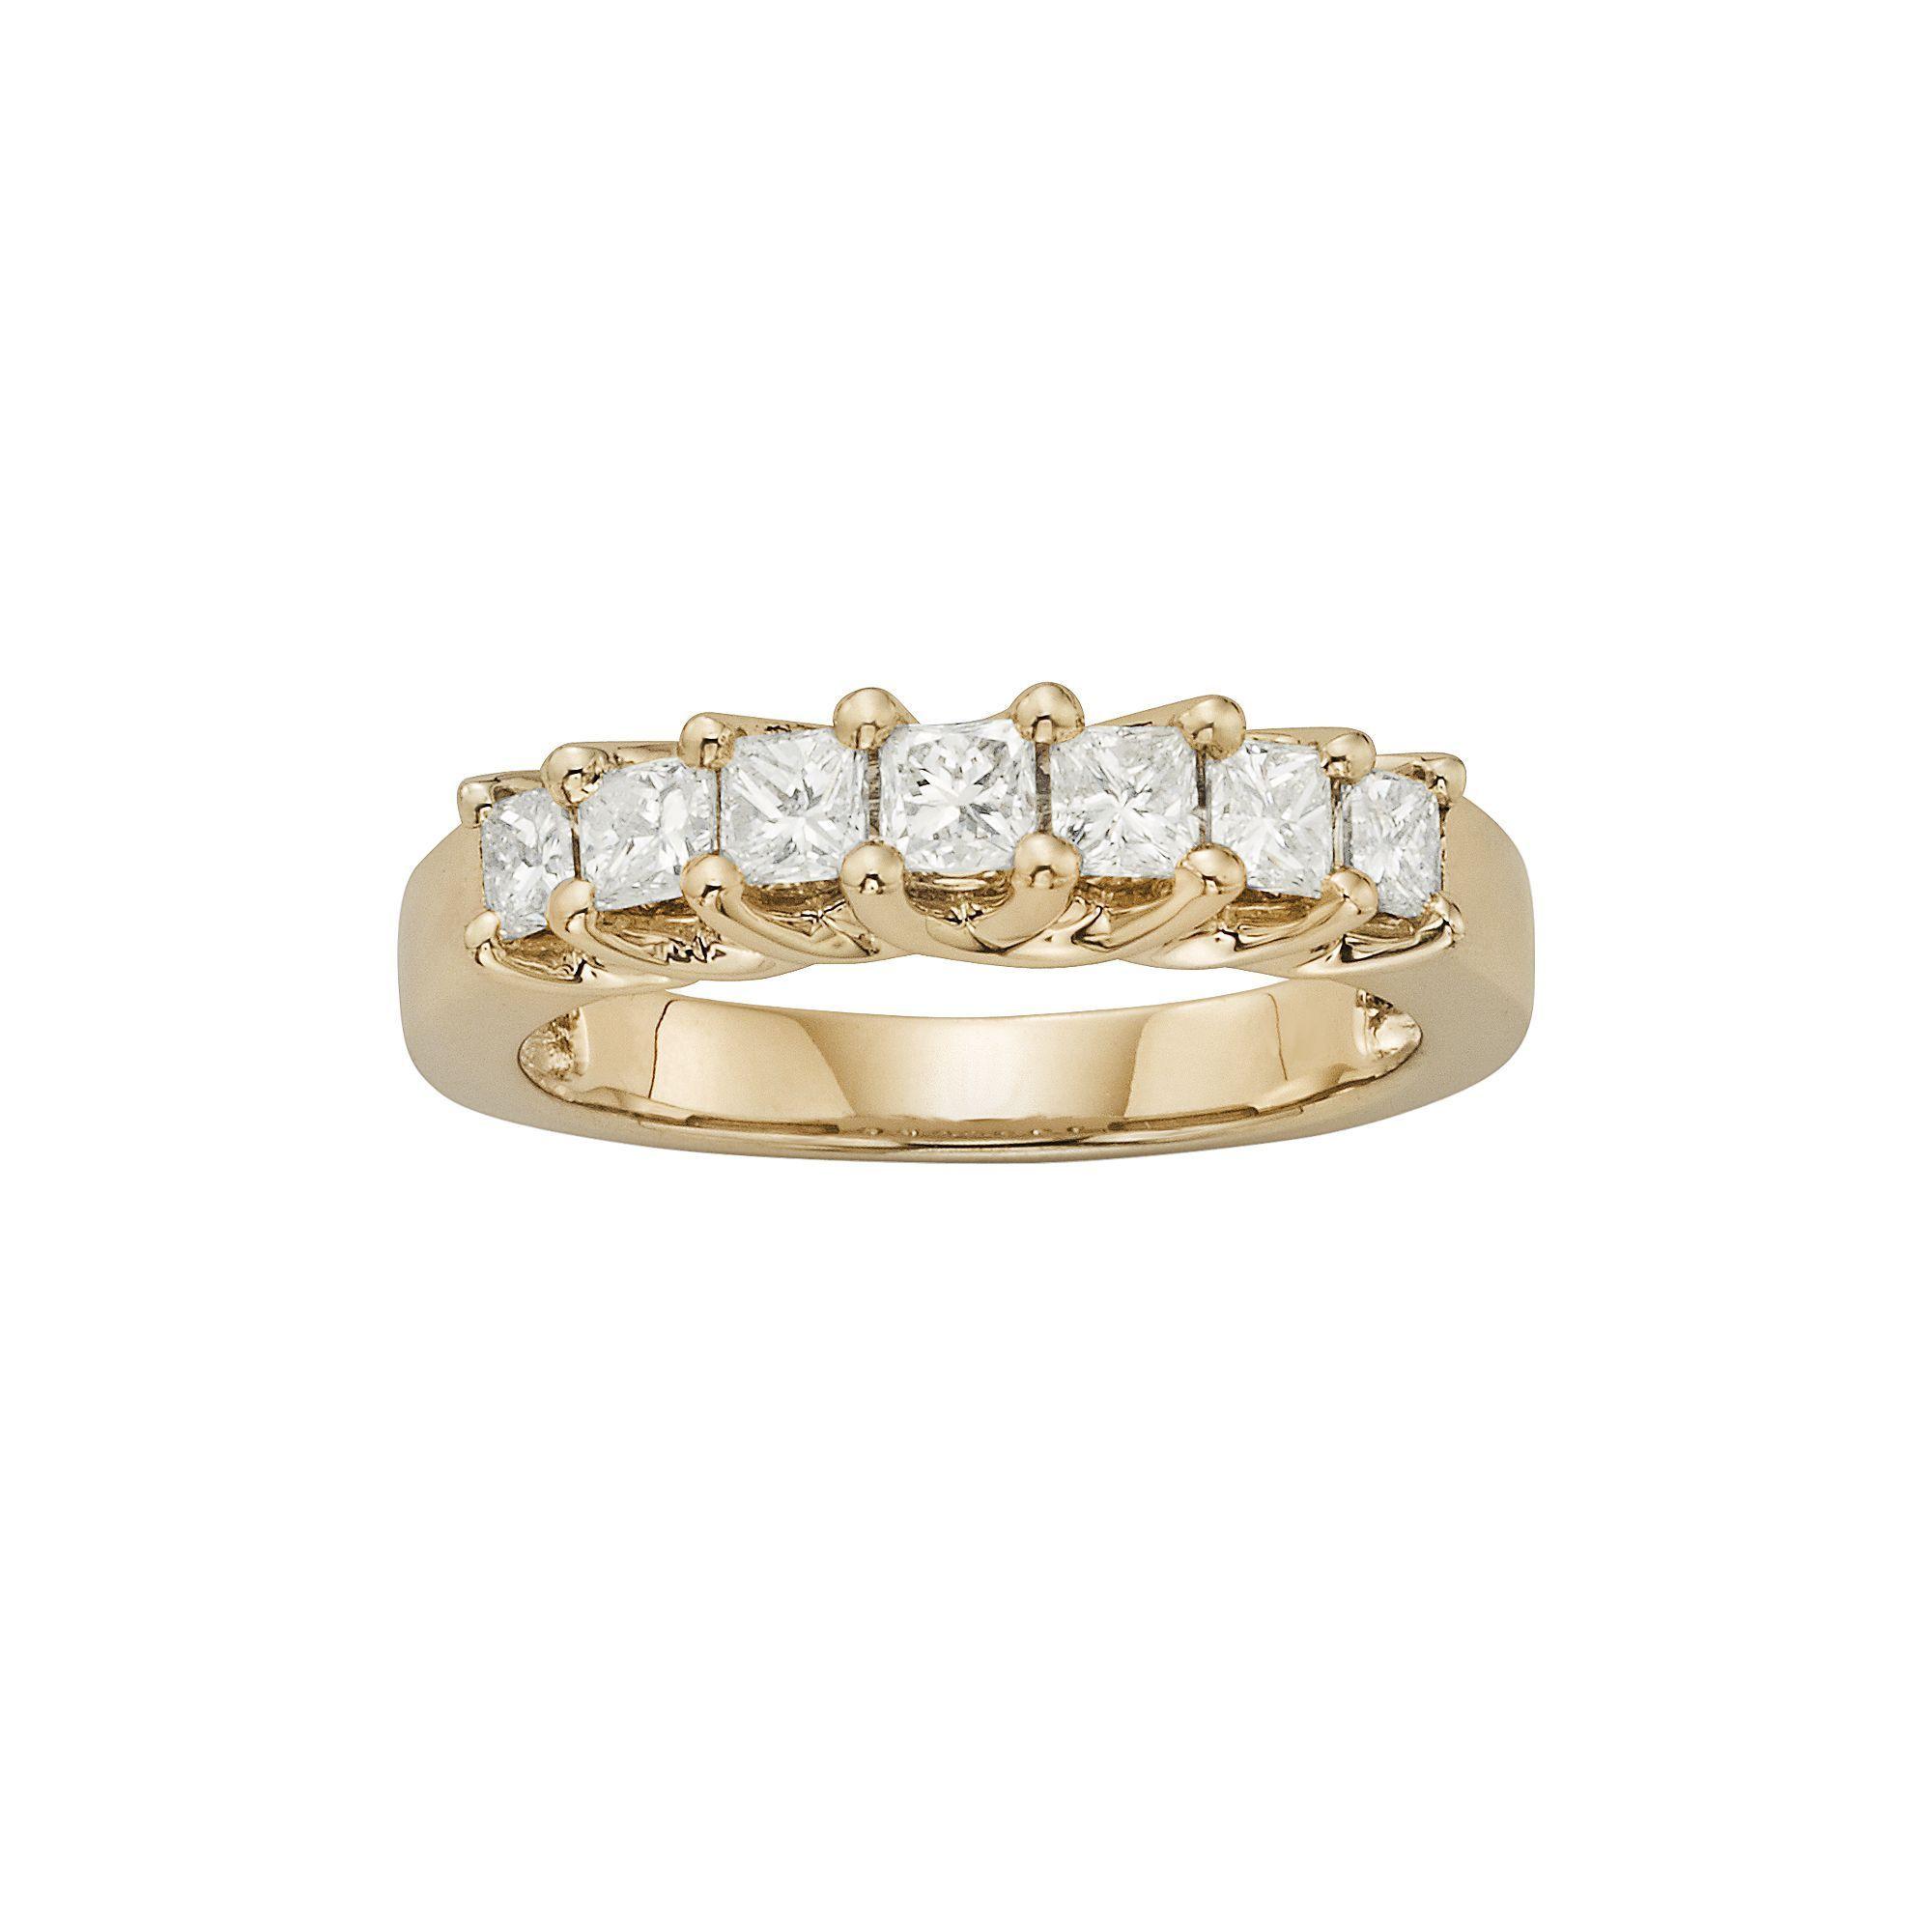 K gold ct tw igl certified princesscut diamond wedding ring